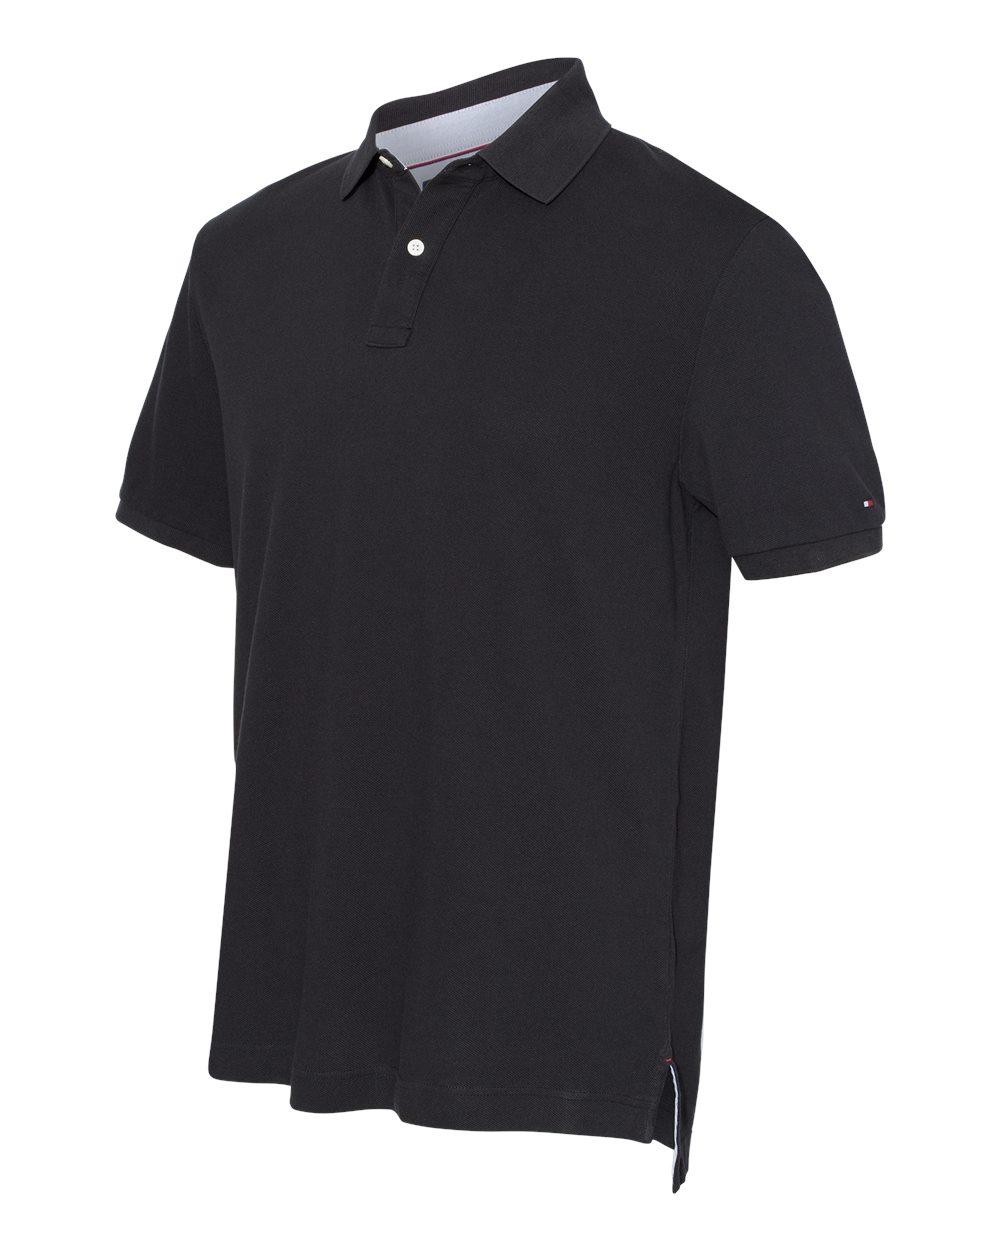 Tommy Hilfiger 13H1867 - Classic Fit Ivy Pique Sport Shirt